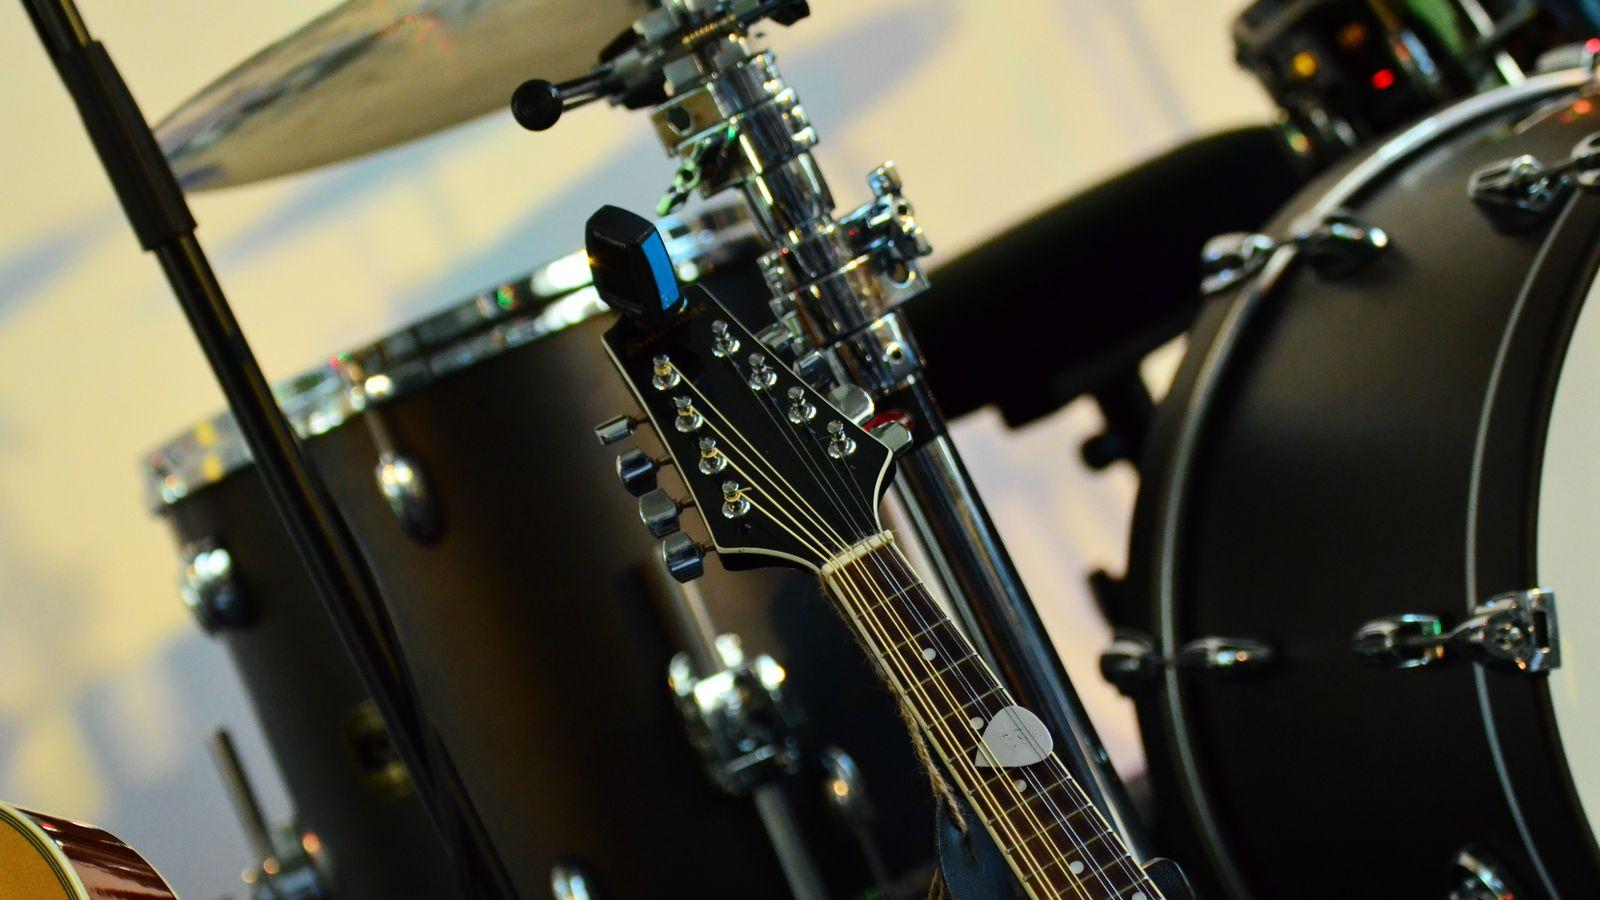 1600x900 Wallpaper musical instrument, music, percussion, guitar